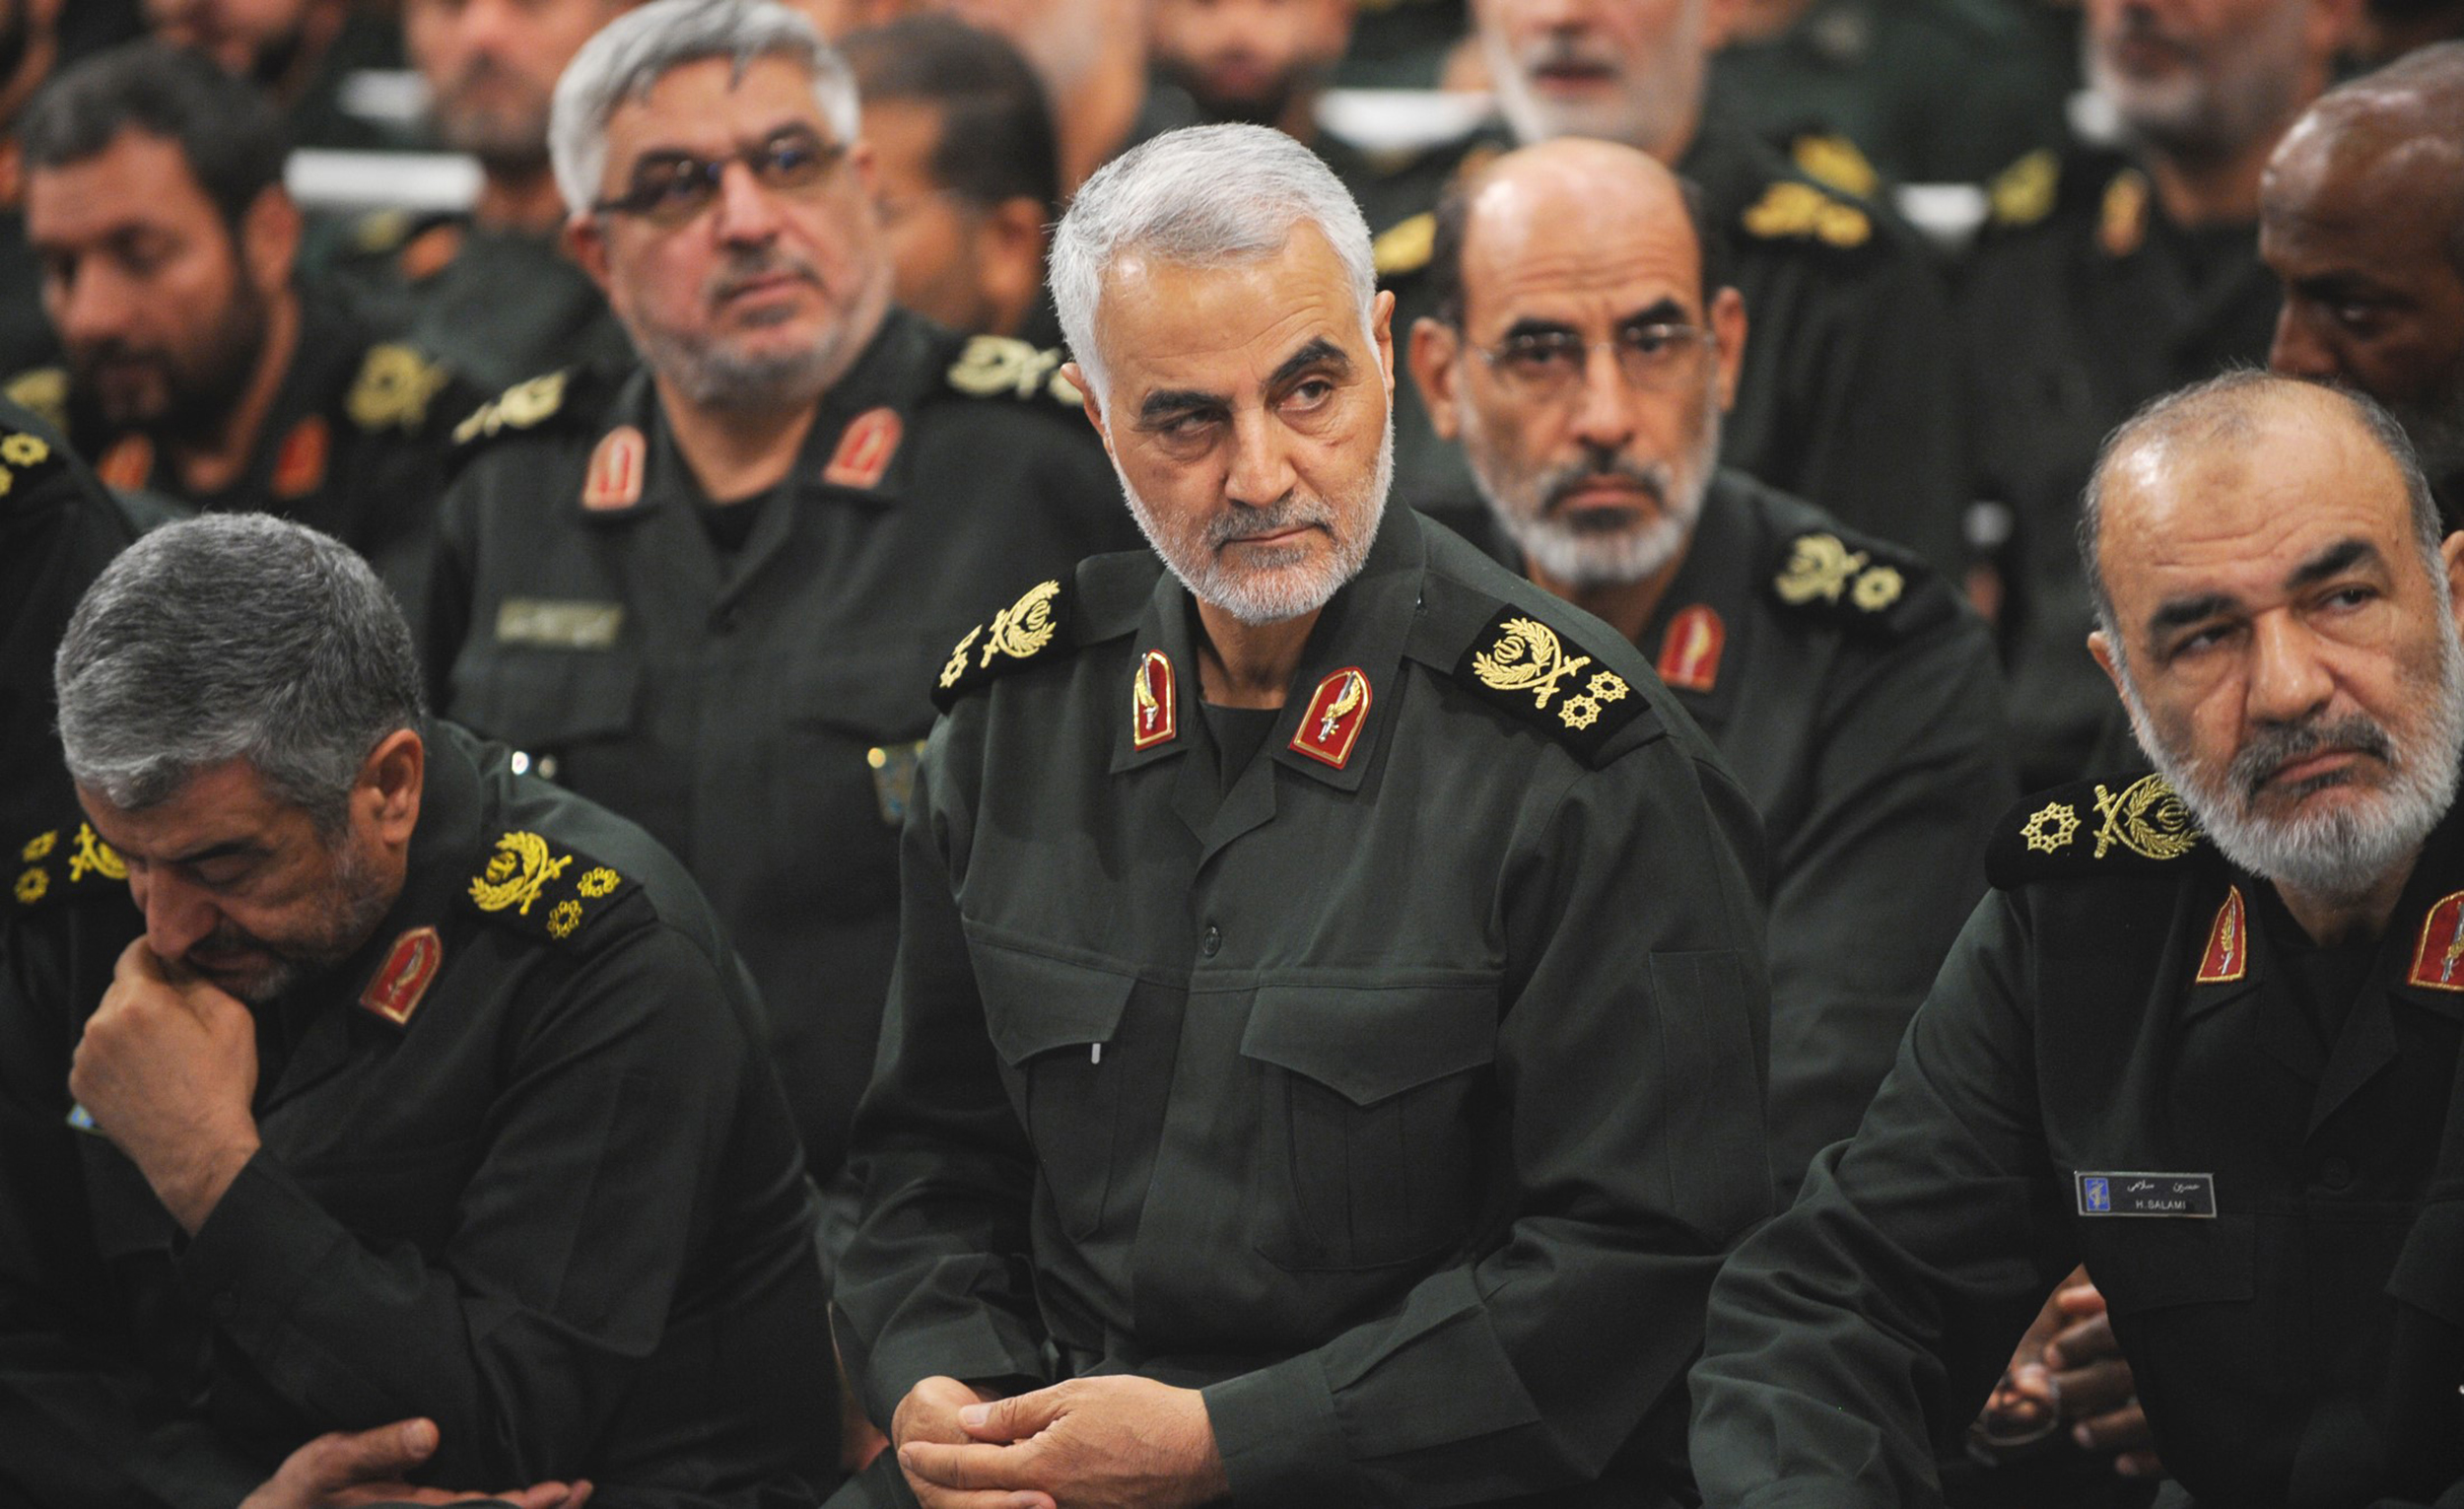 Image: Iranian Quds Force commander Qassem Soleimani